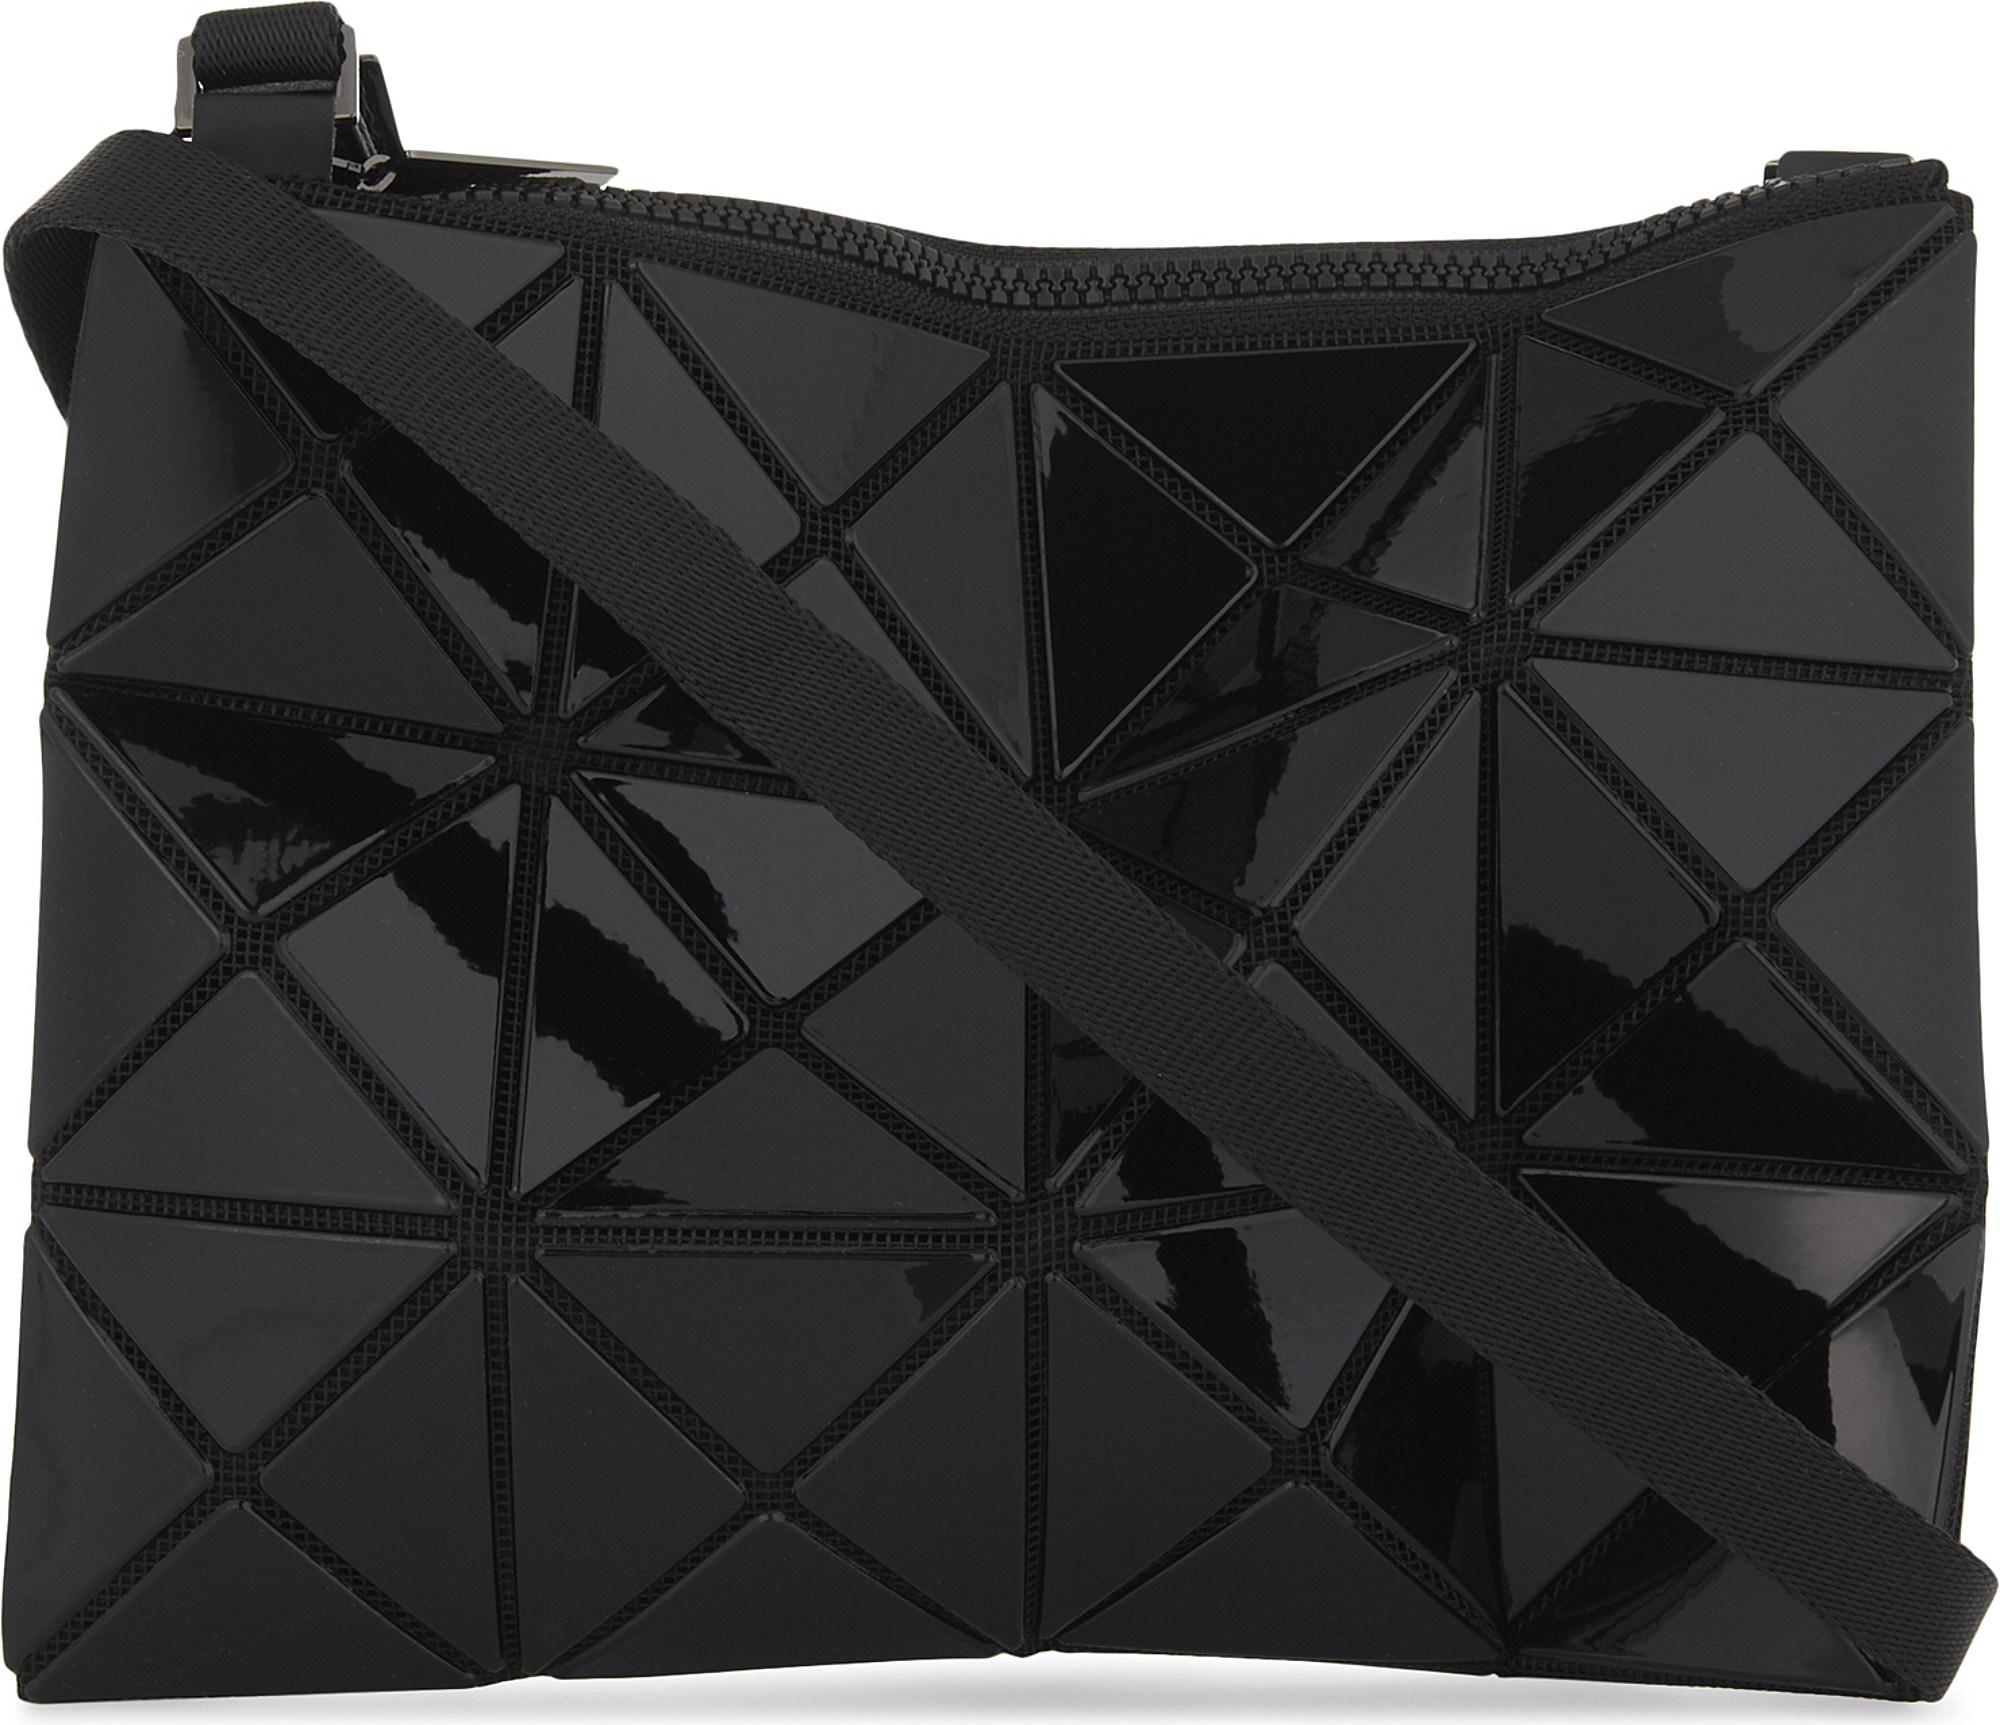 ec3a08f2706e Bao Bao Issey Miyake Lucent Cross-body Bag in Black - Lyst